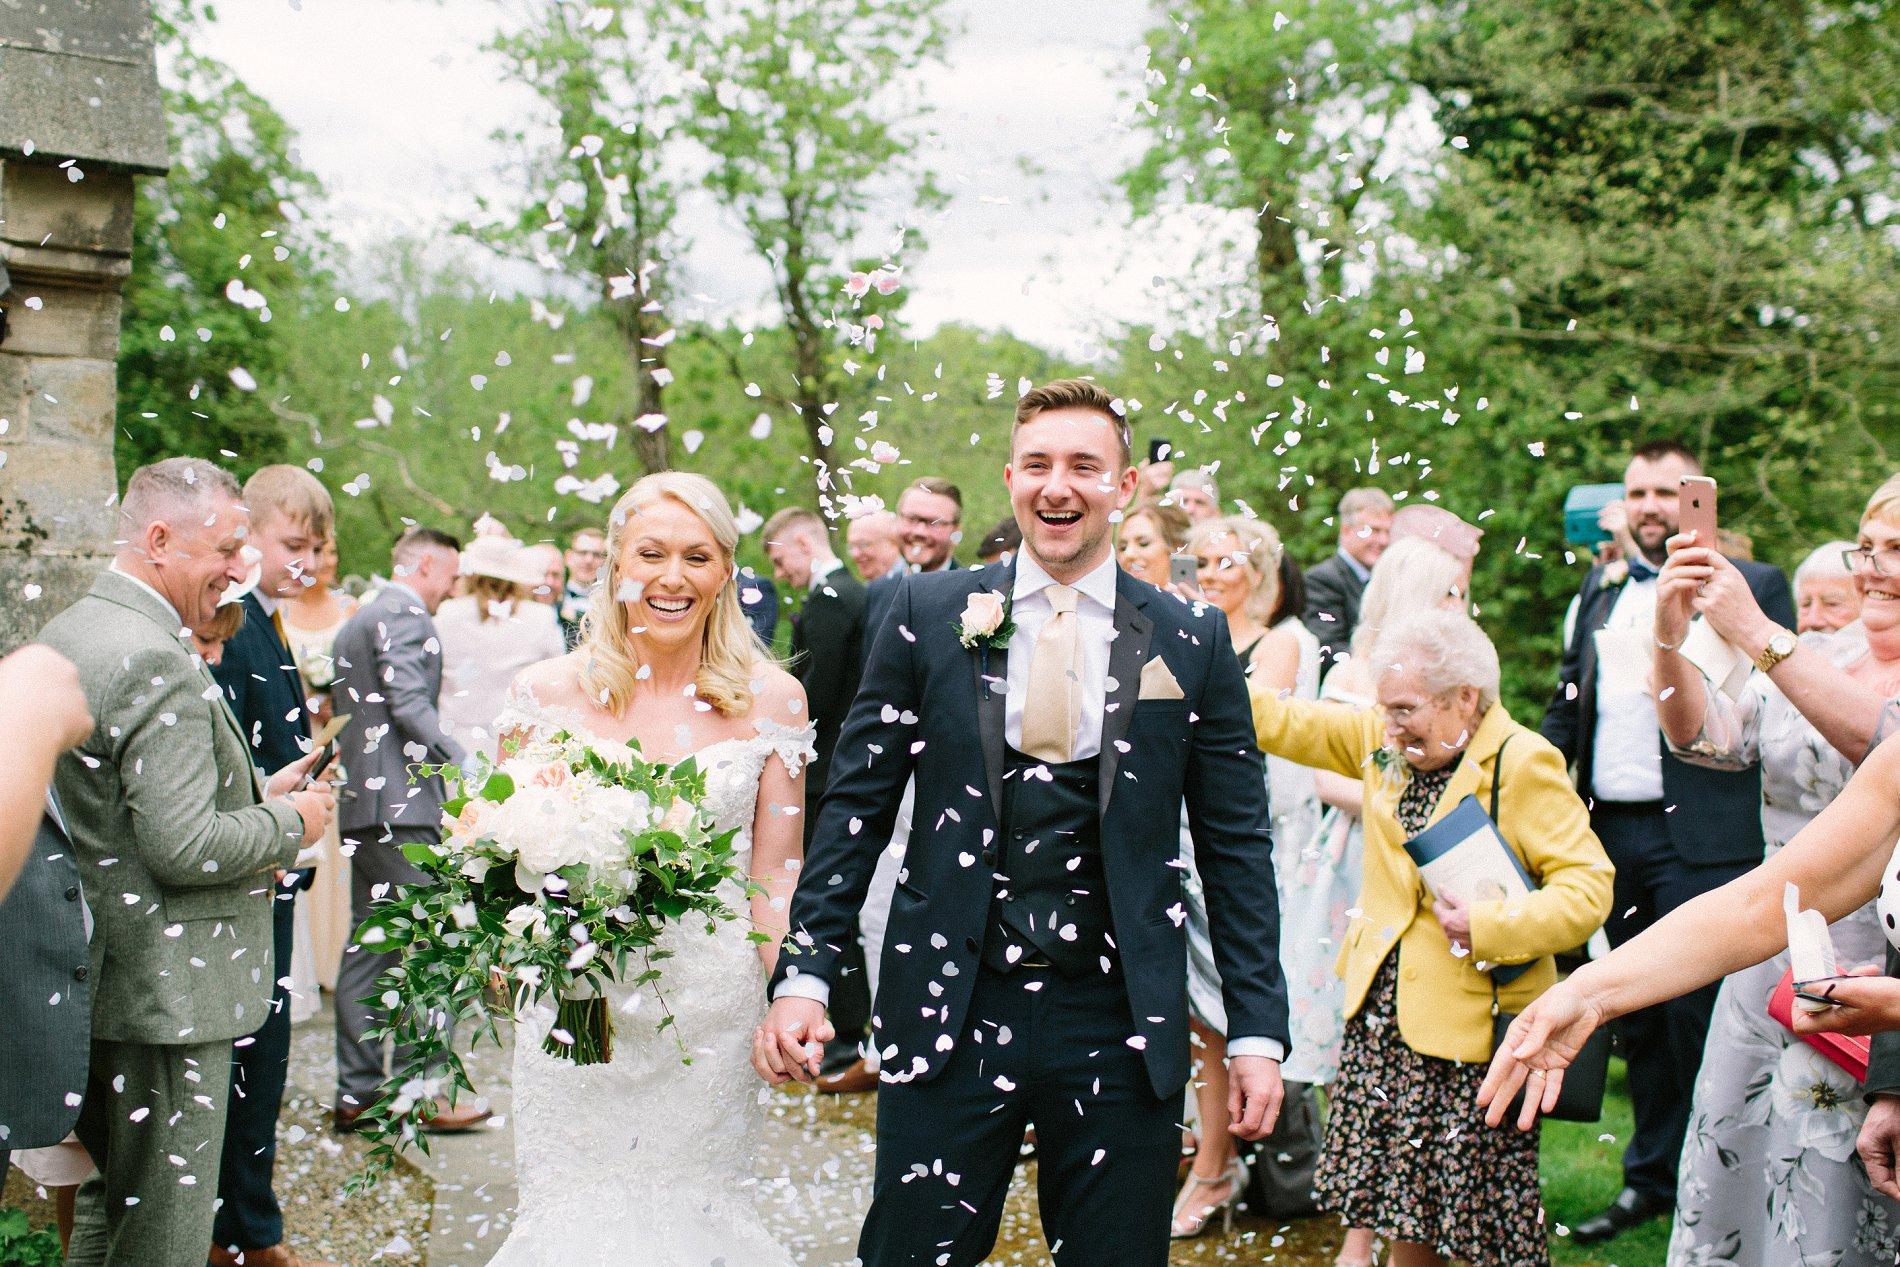 A PRETTY SPRING WEDDING AT NEWTON HALL – KIRSTY & JOSH